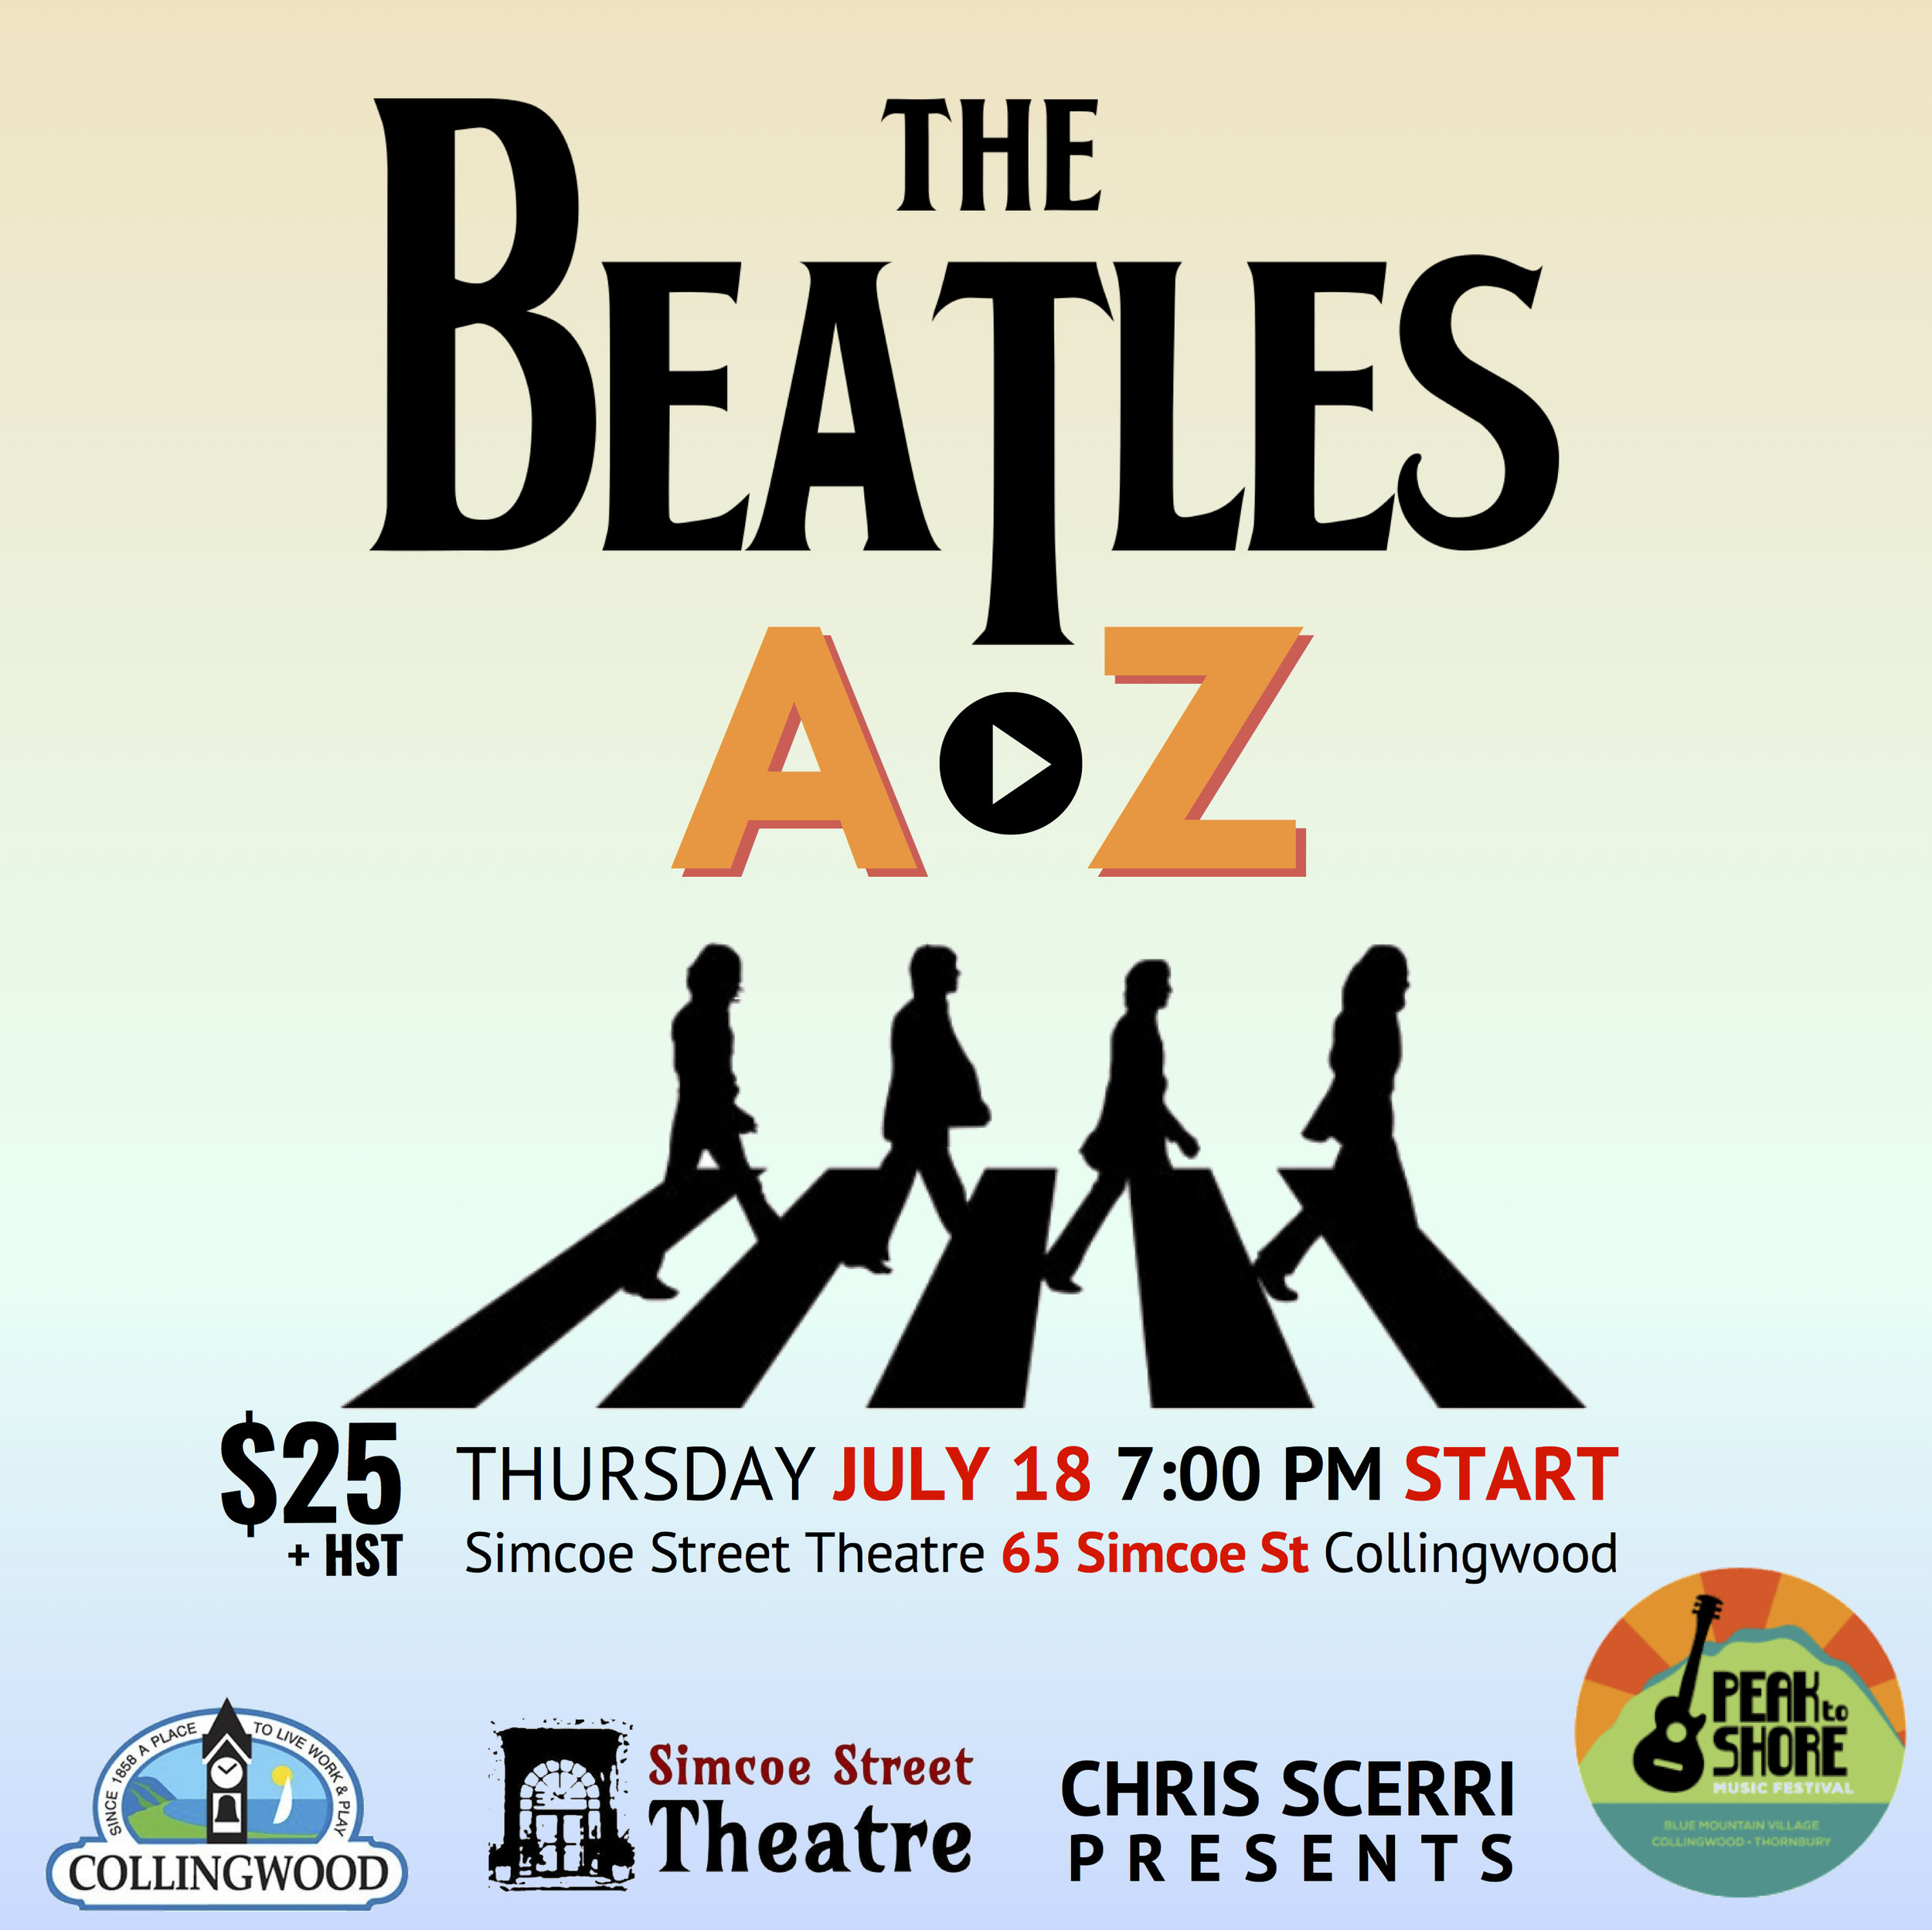 Chris Scerri Presents - The Beatles A-Z .jpg